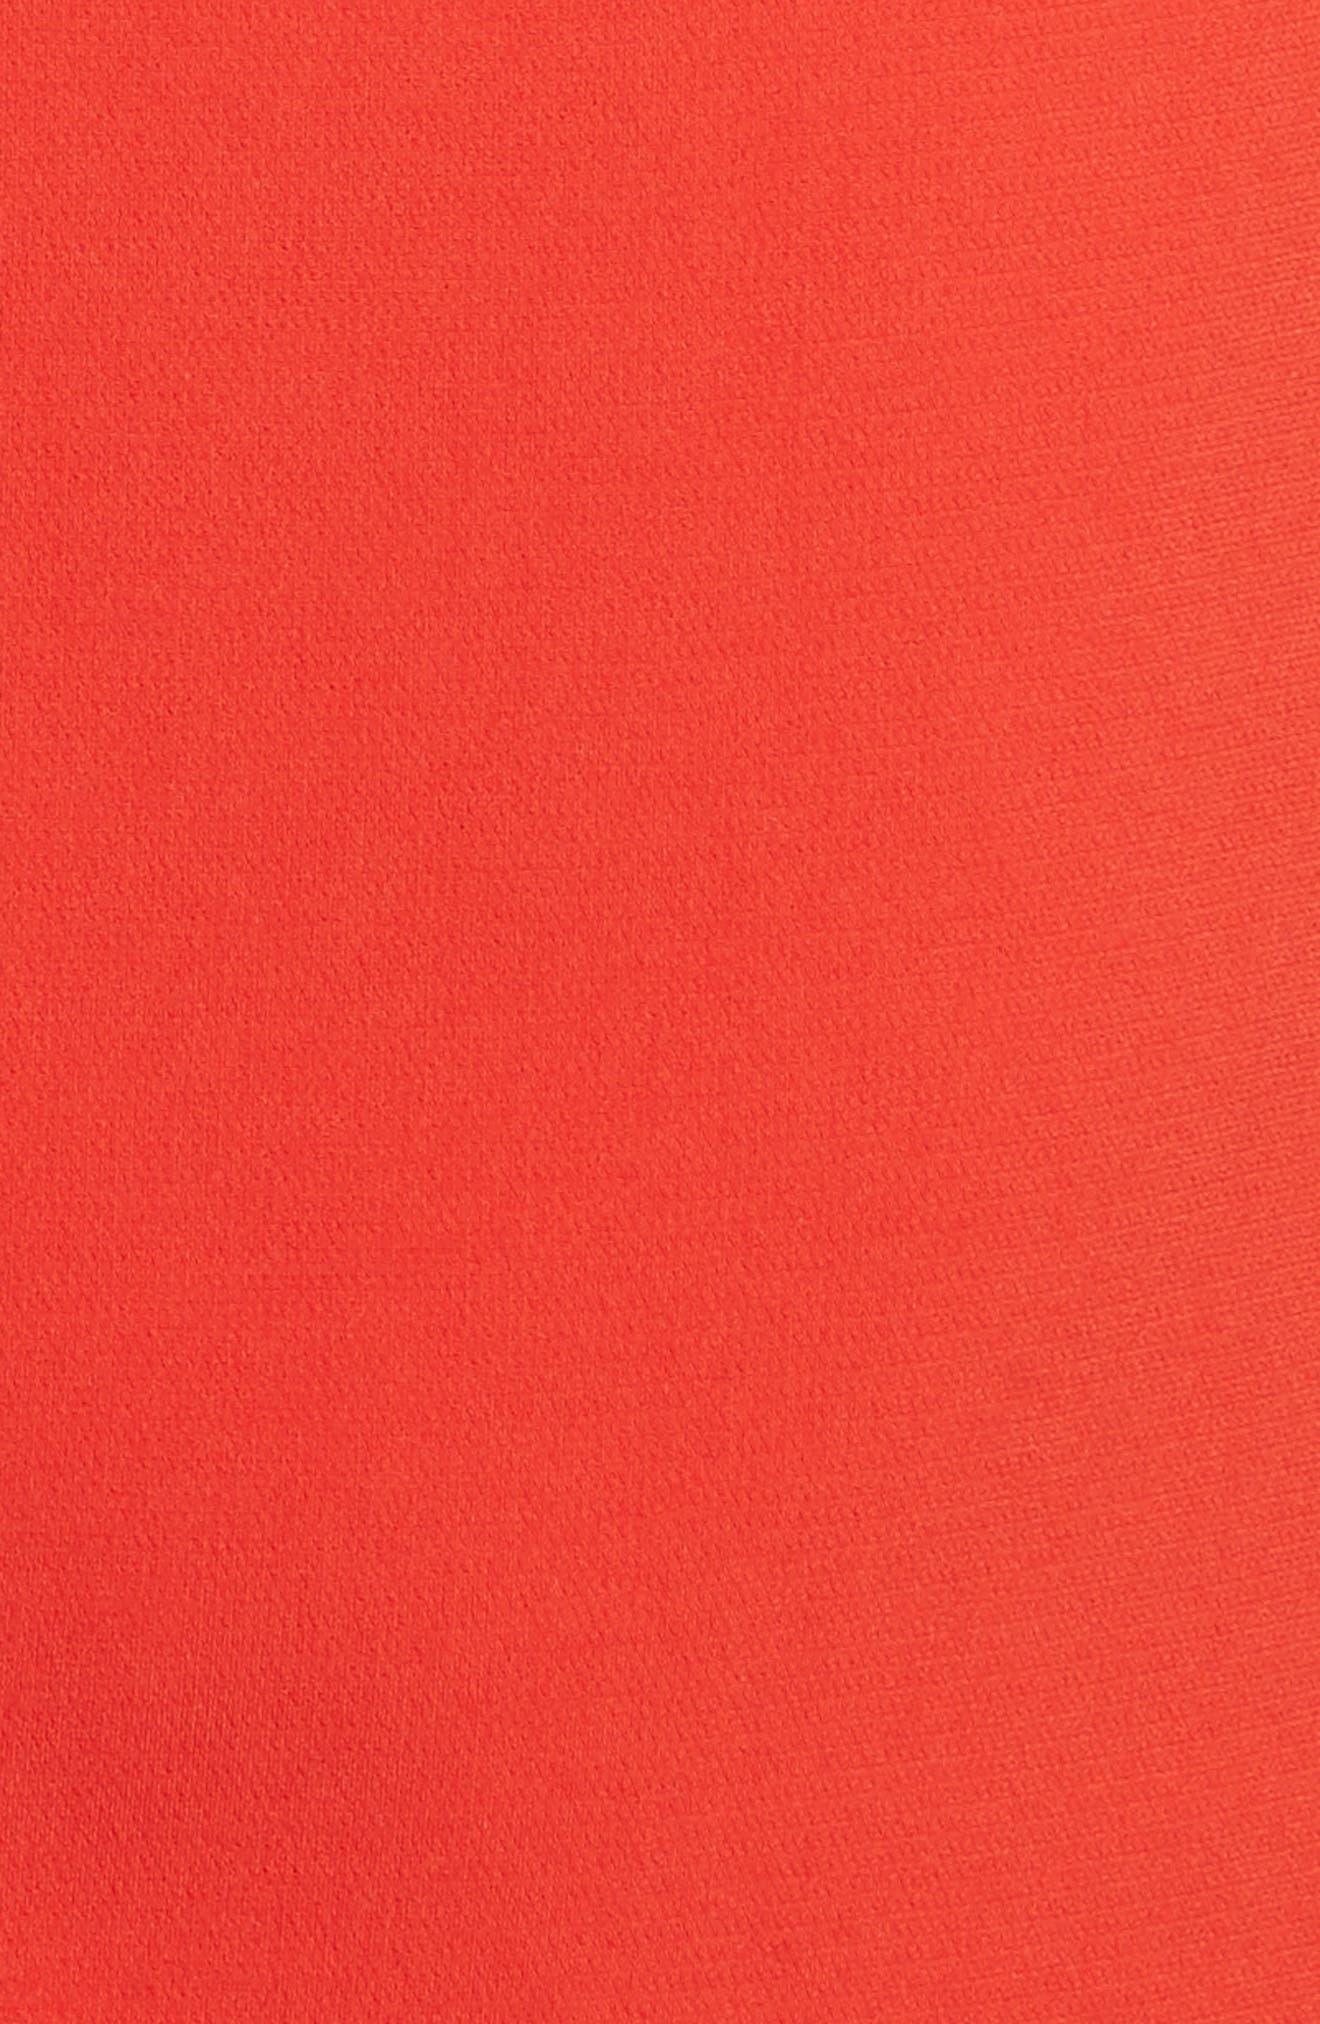 Admiral Crepe V-Neck Shift Dress,                             Alternate thumbnail 5, color,                             Bright Tomato